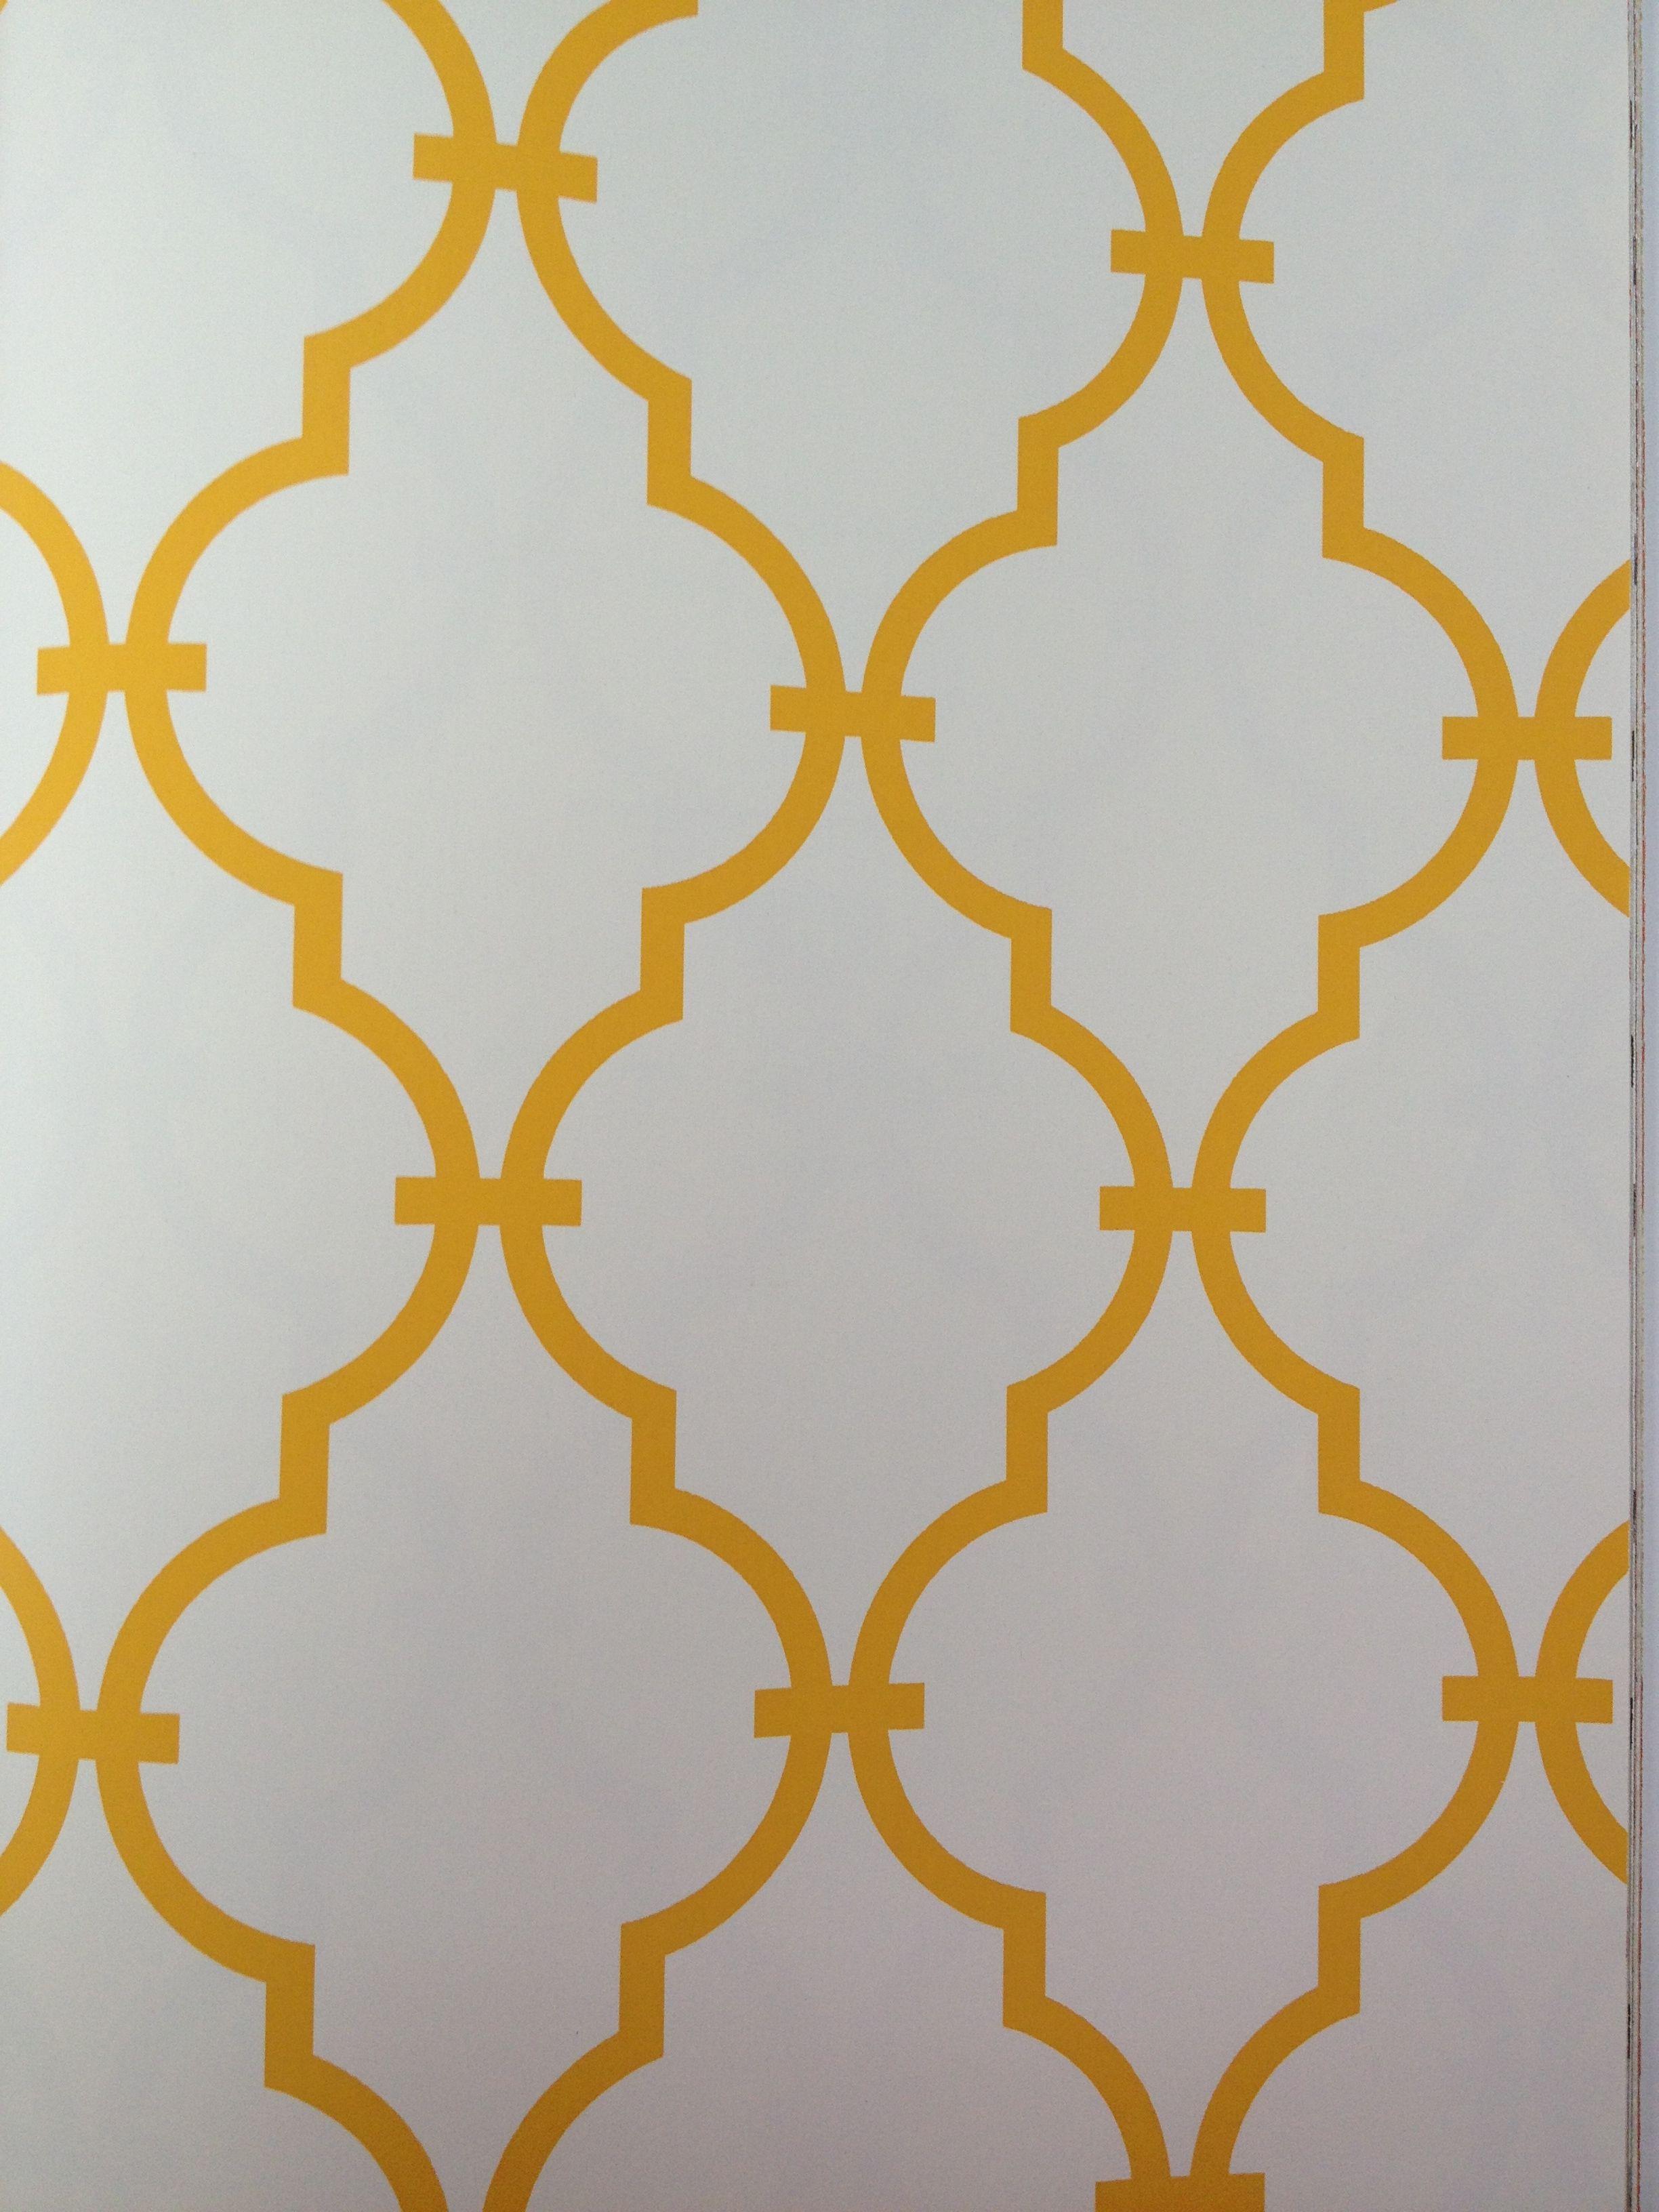 Golden Yellow Projekter